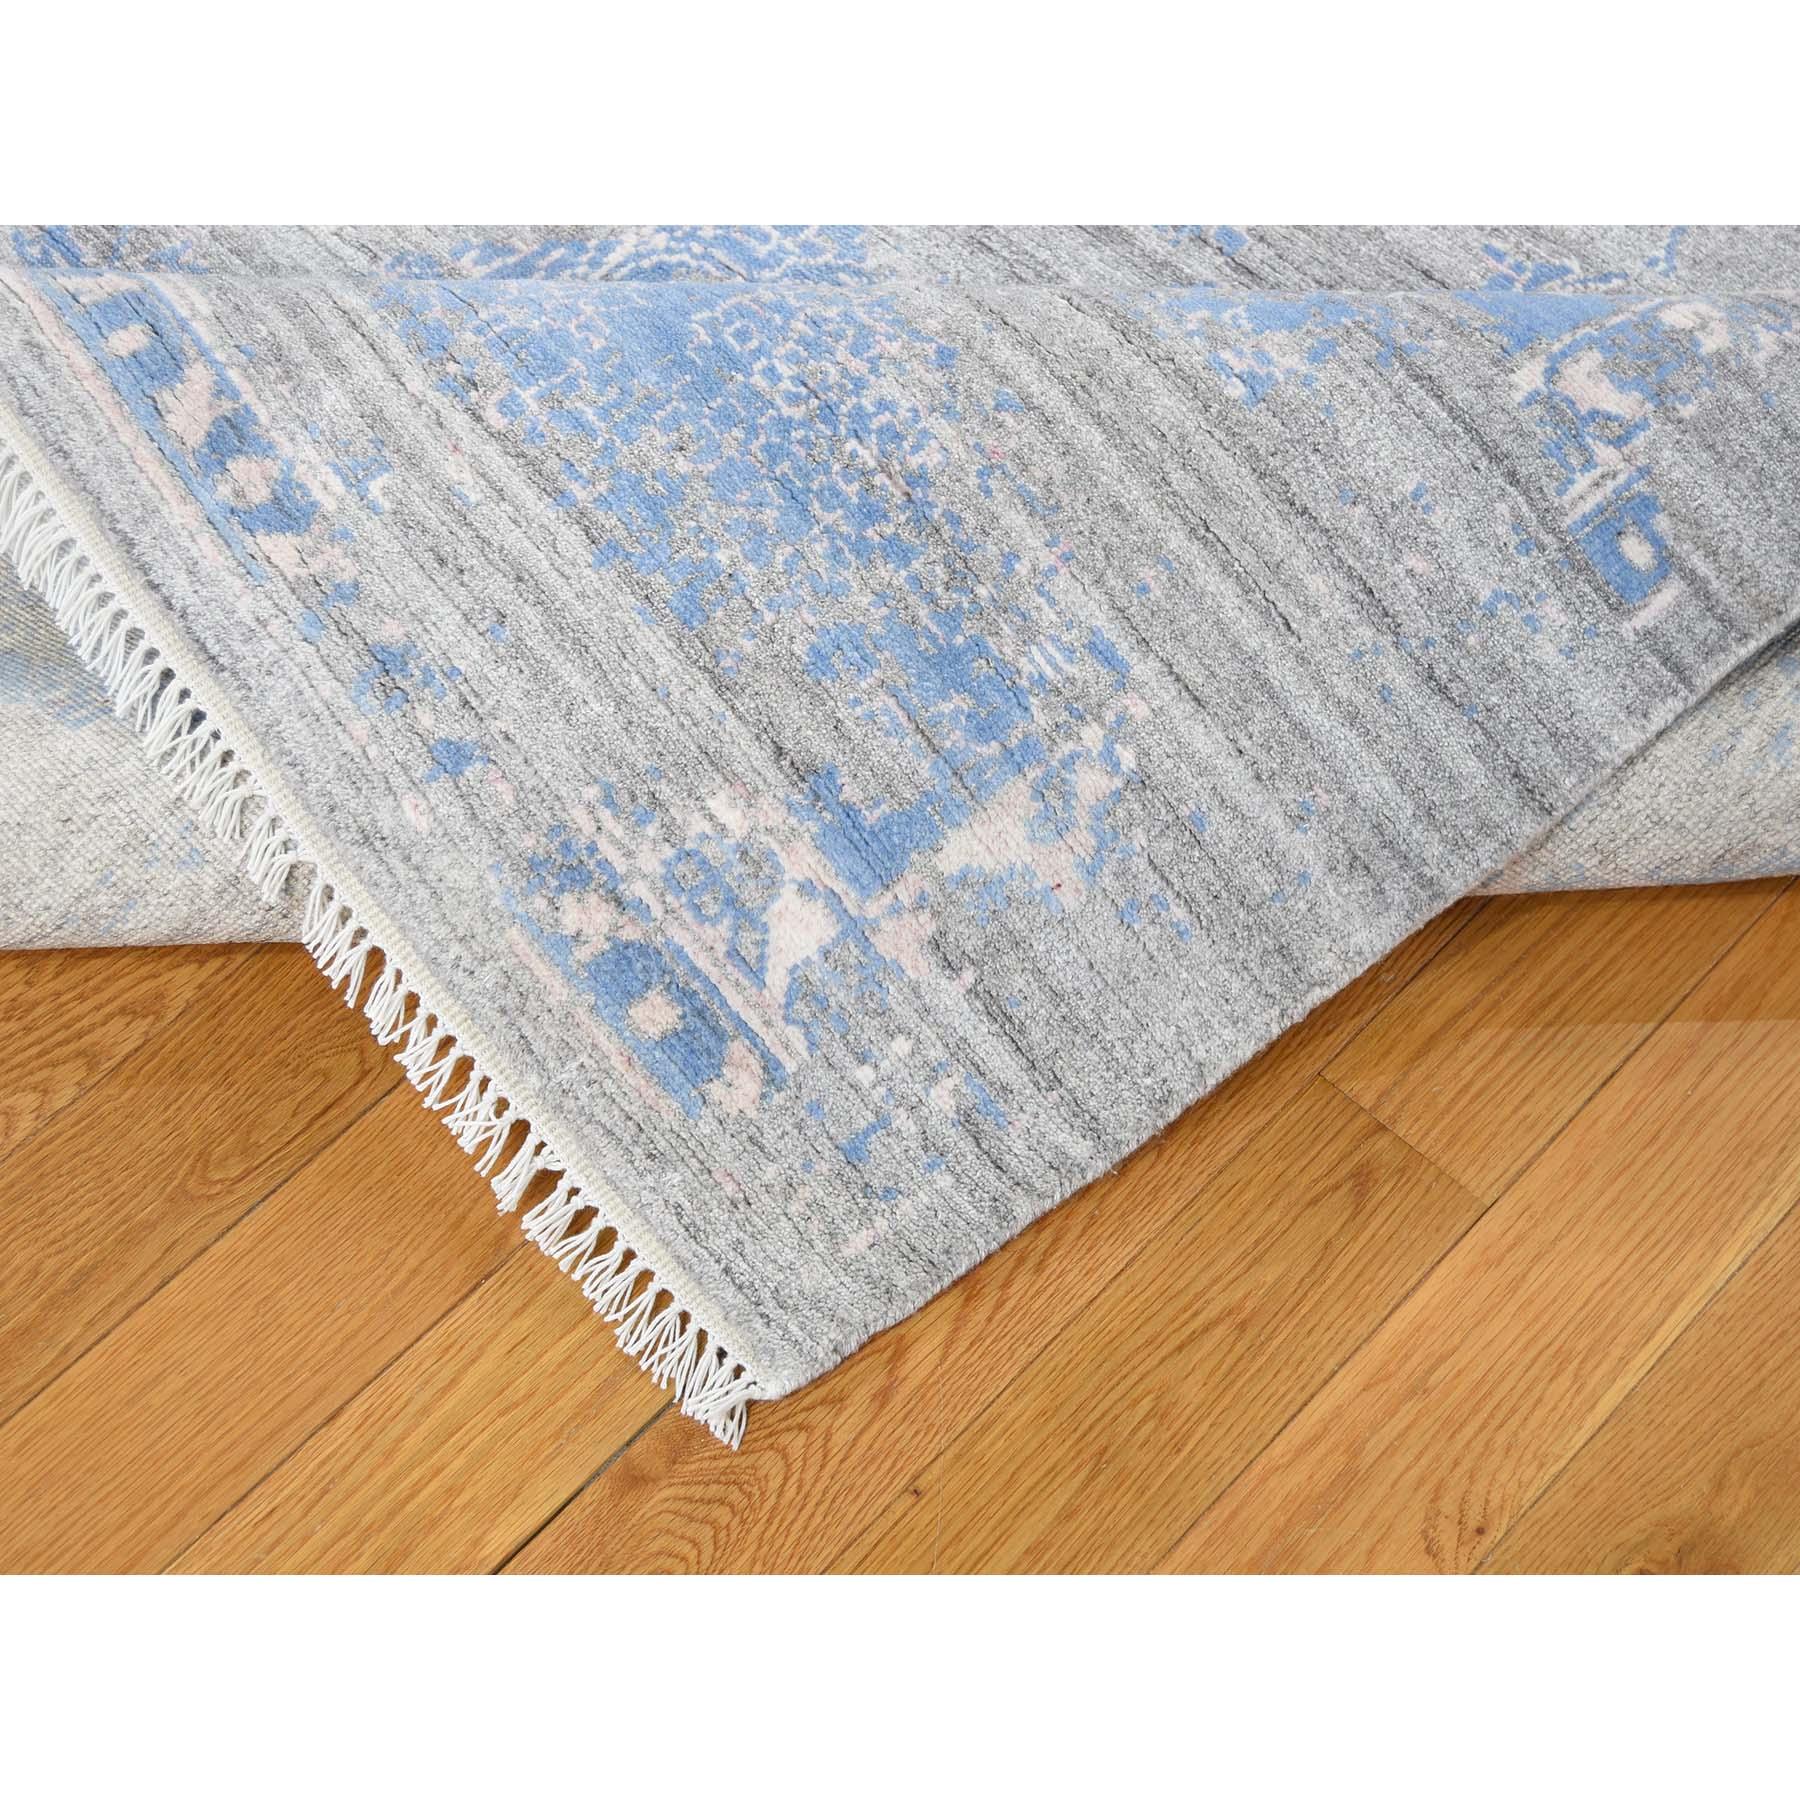 9-1 x12-2  Wool and Silk Broken Agra Design Hand-Knotted Oriental Rug